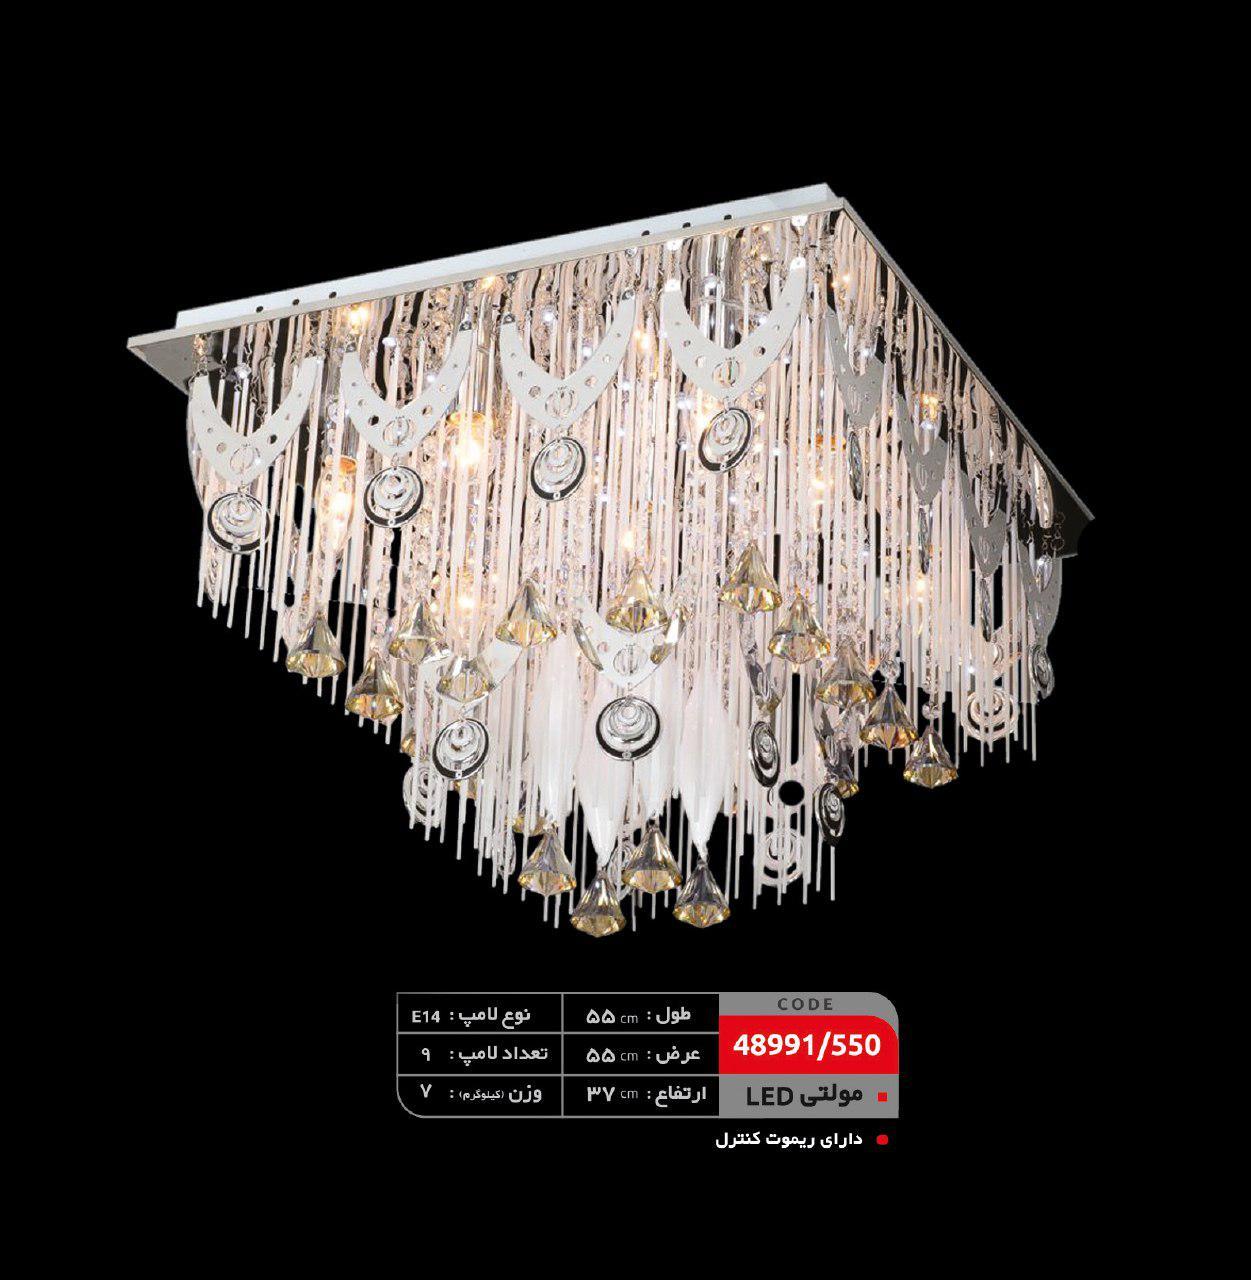 لوستر سقفی مولتی LED(کد: ۵۵۰/ ۴۸۹۹۱) |